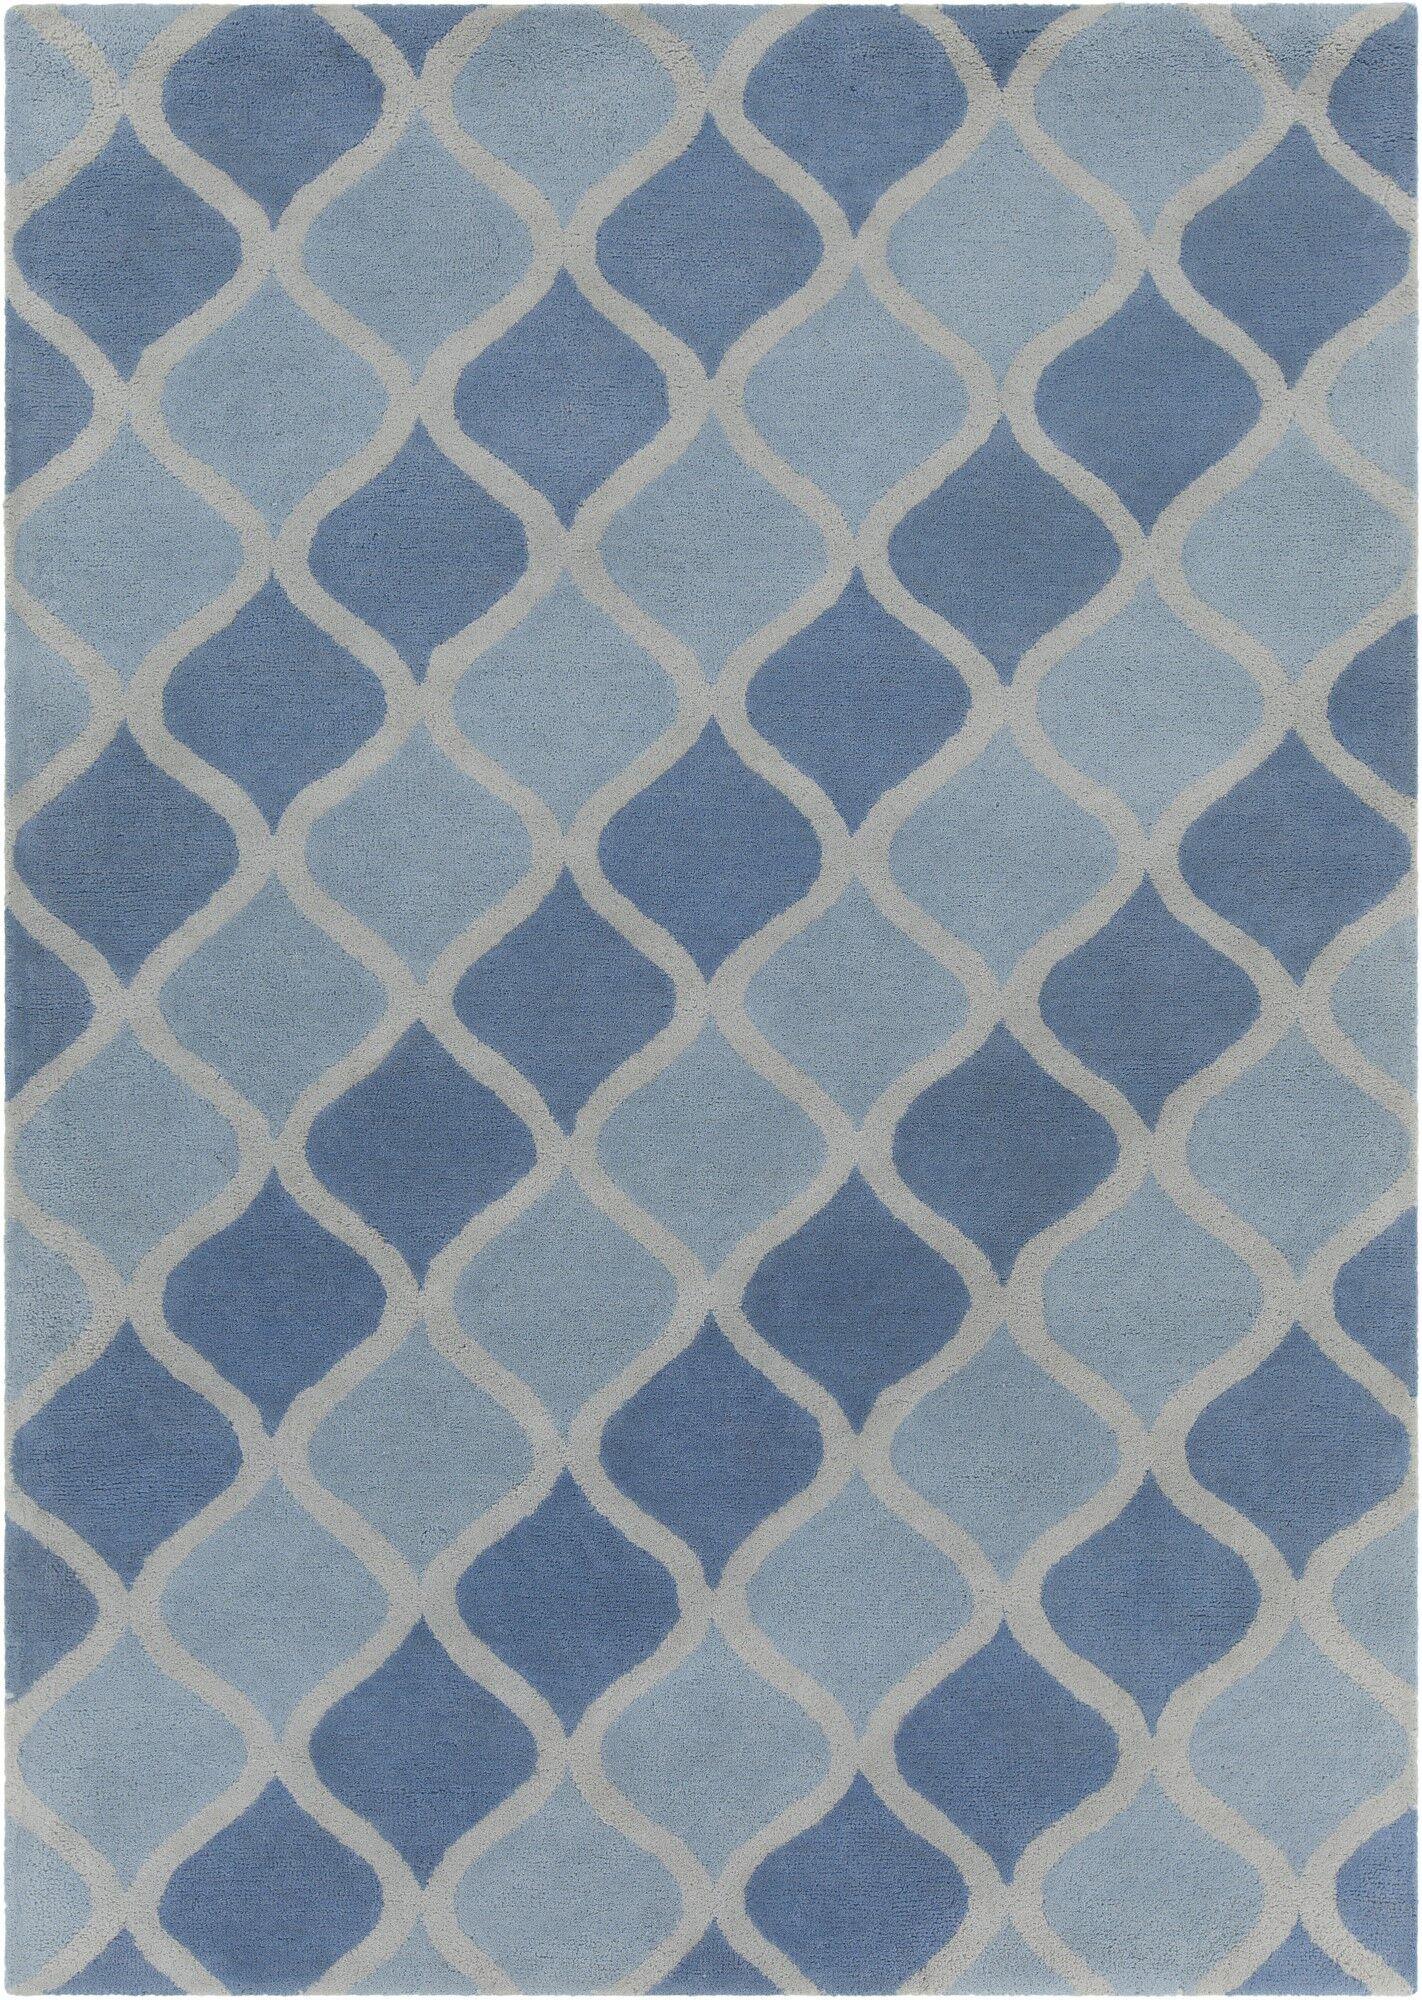 Erith Hand Tufted Rectangle Contemporary Aqua/Blue Area Rug Rug Size: 7' x 10'